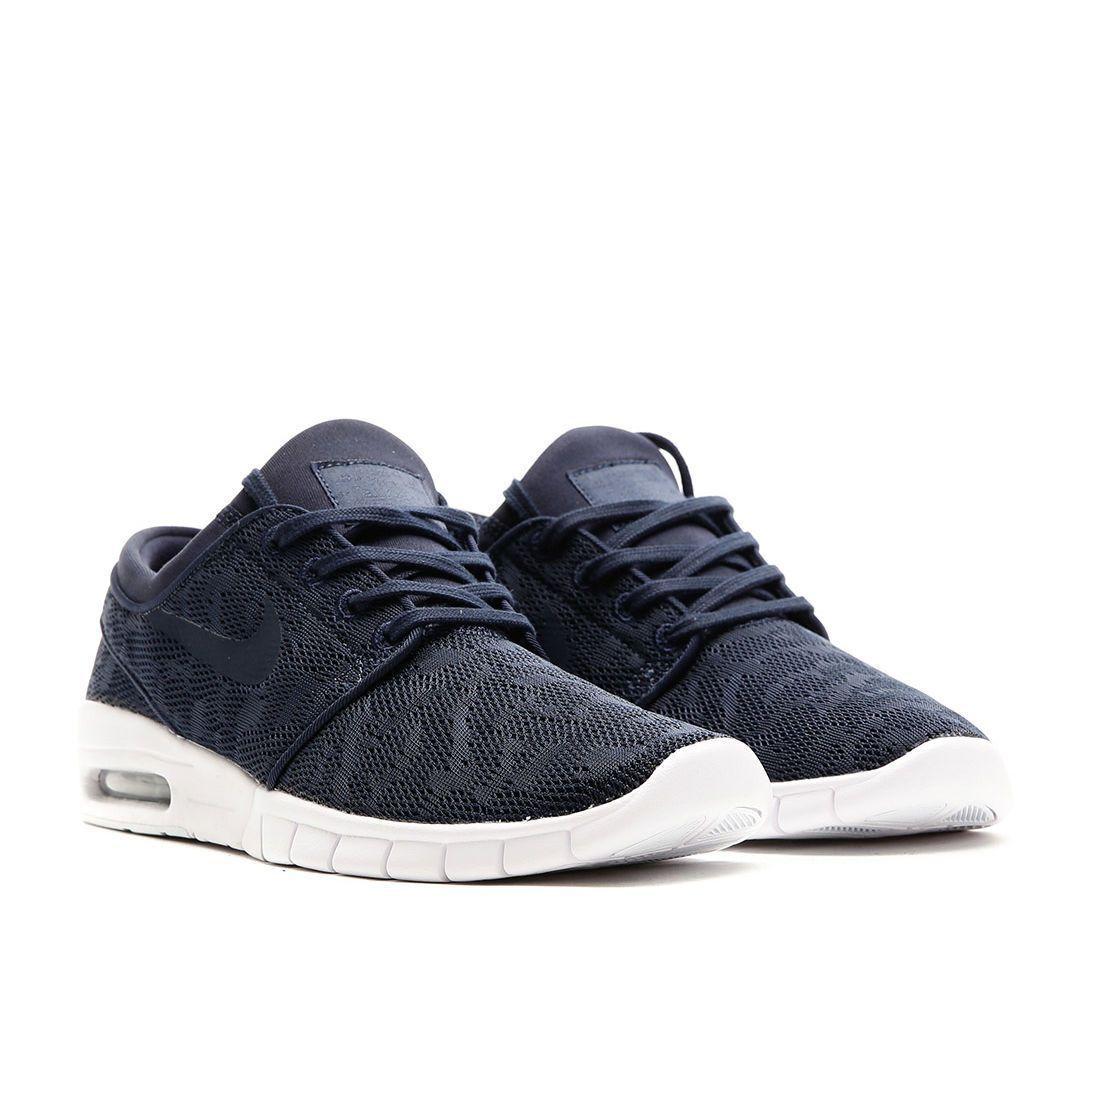 Nike SB Stefan Janoski MaxTalla /US 9/UE 42.5 Marino  6320183447  Azul Marino 42.5 396f87